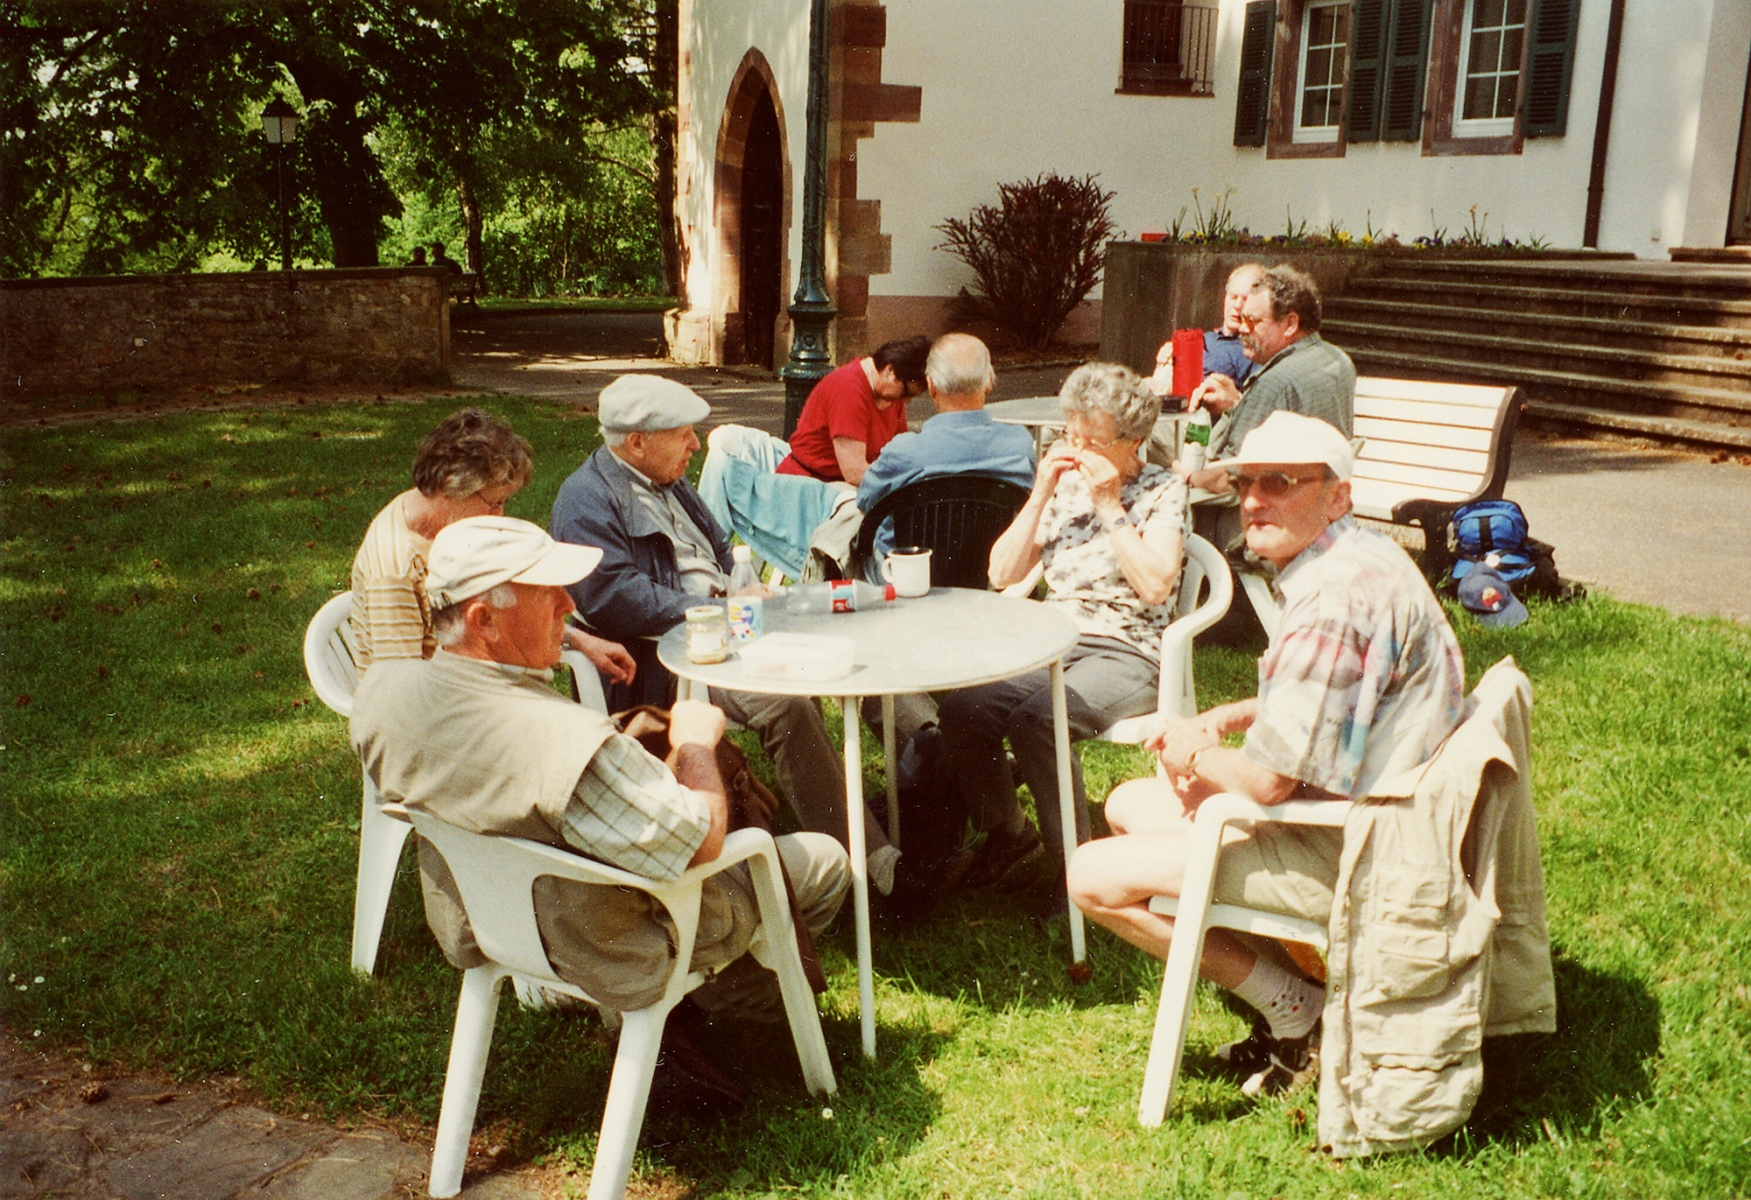 2004_09_01 Arzviller, Rucksackvesper